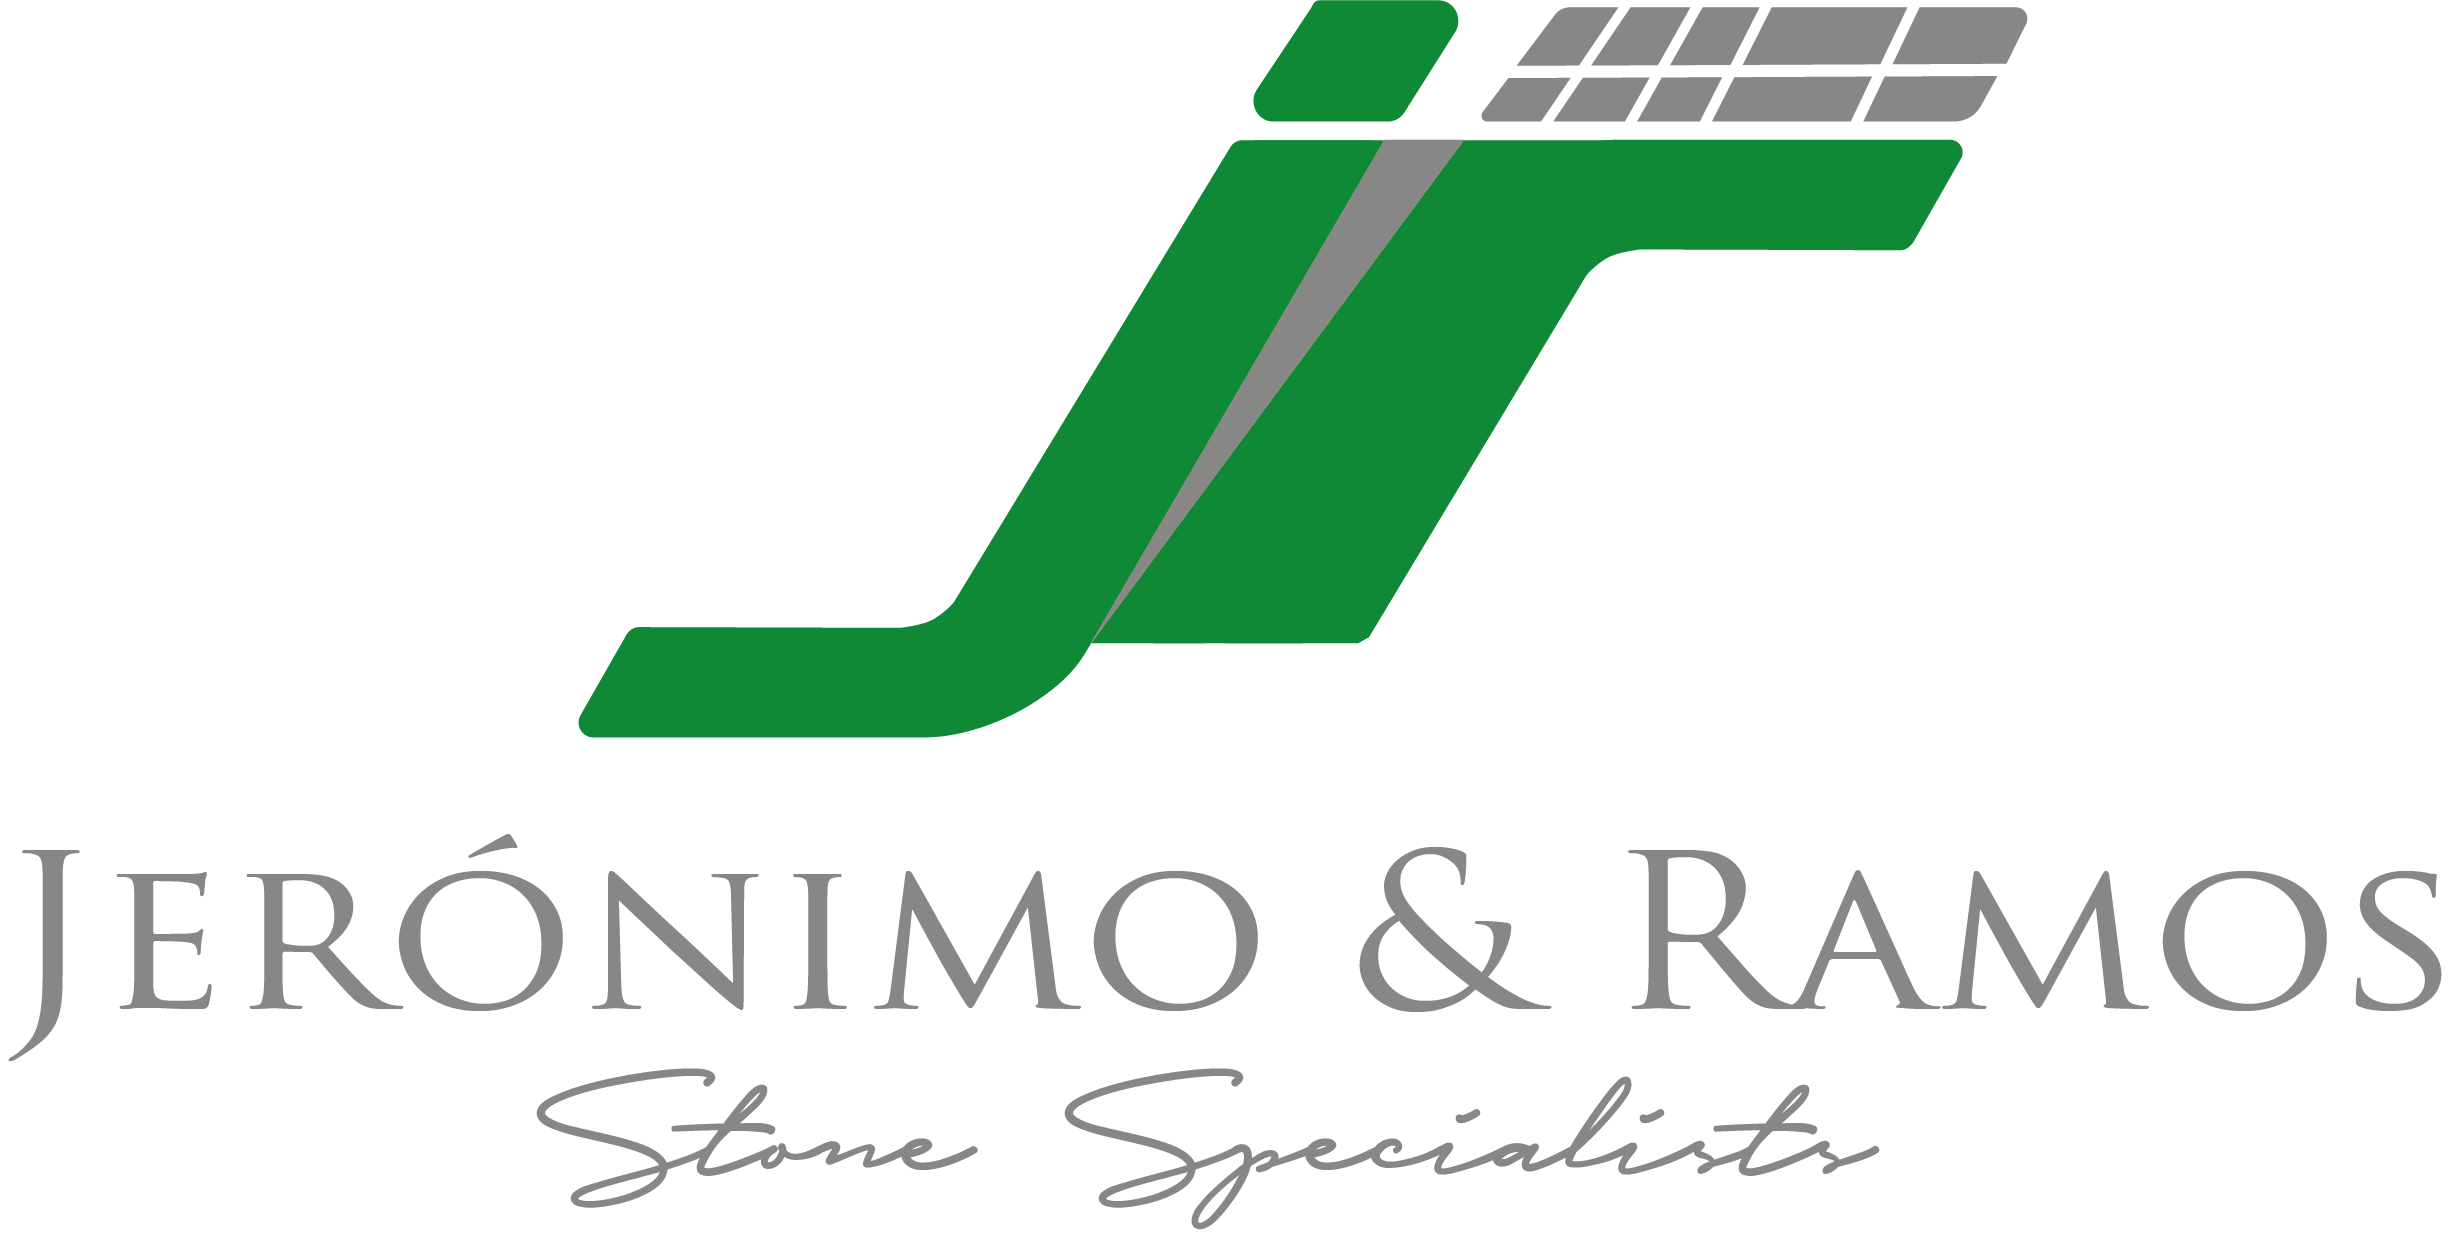 Jerónimo & Ramos, Lda